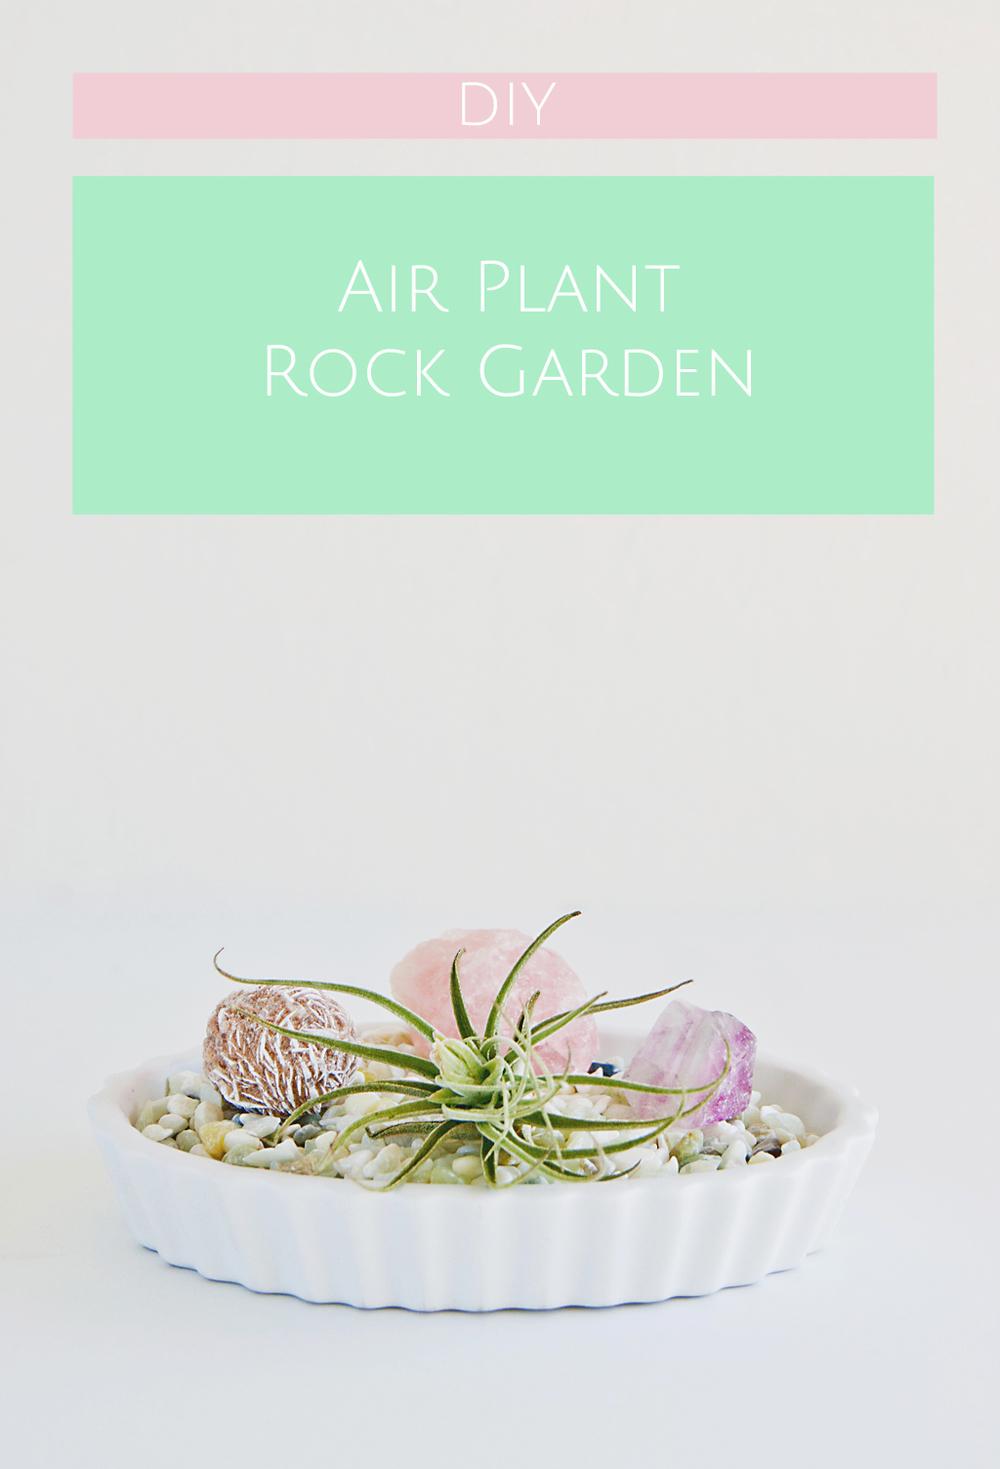 DIY Air Plant Rock Garden